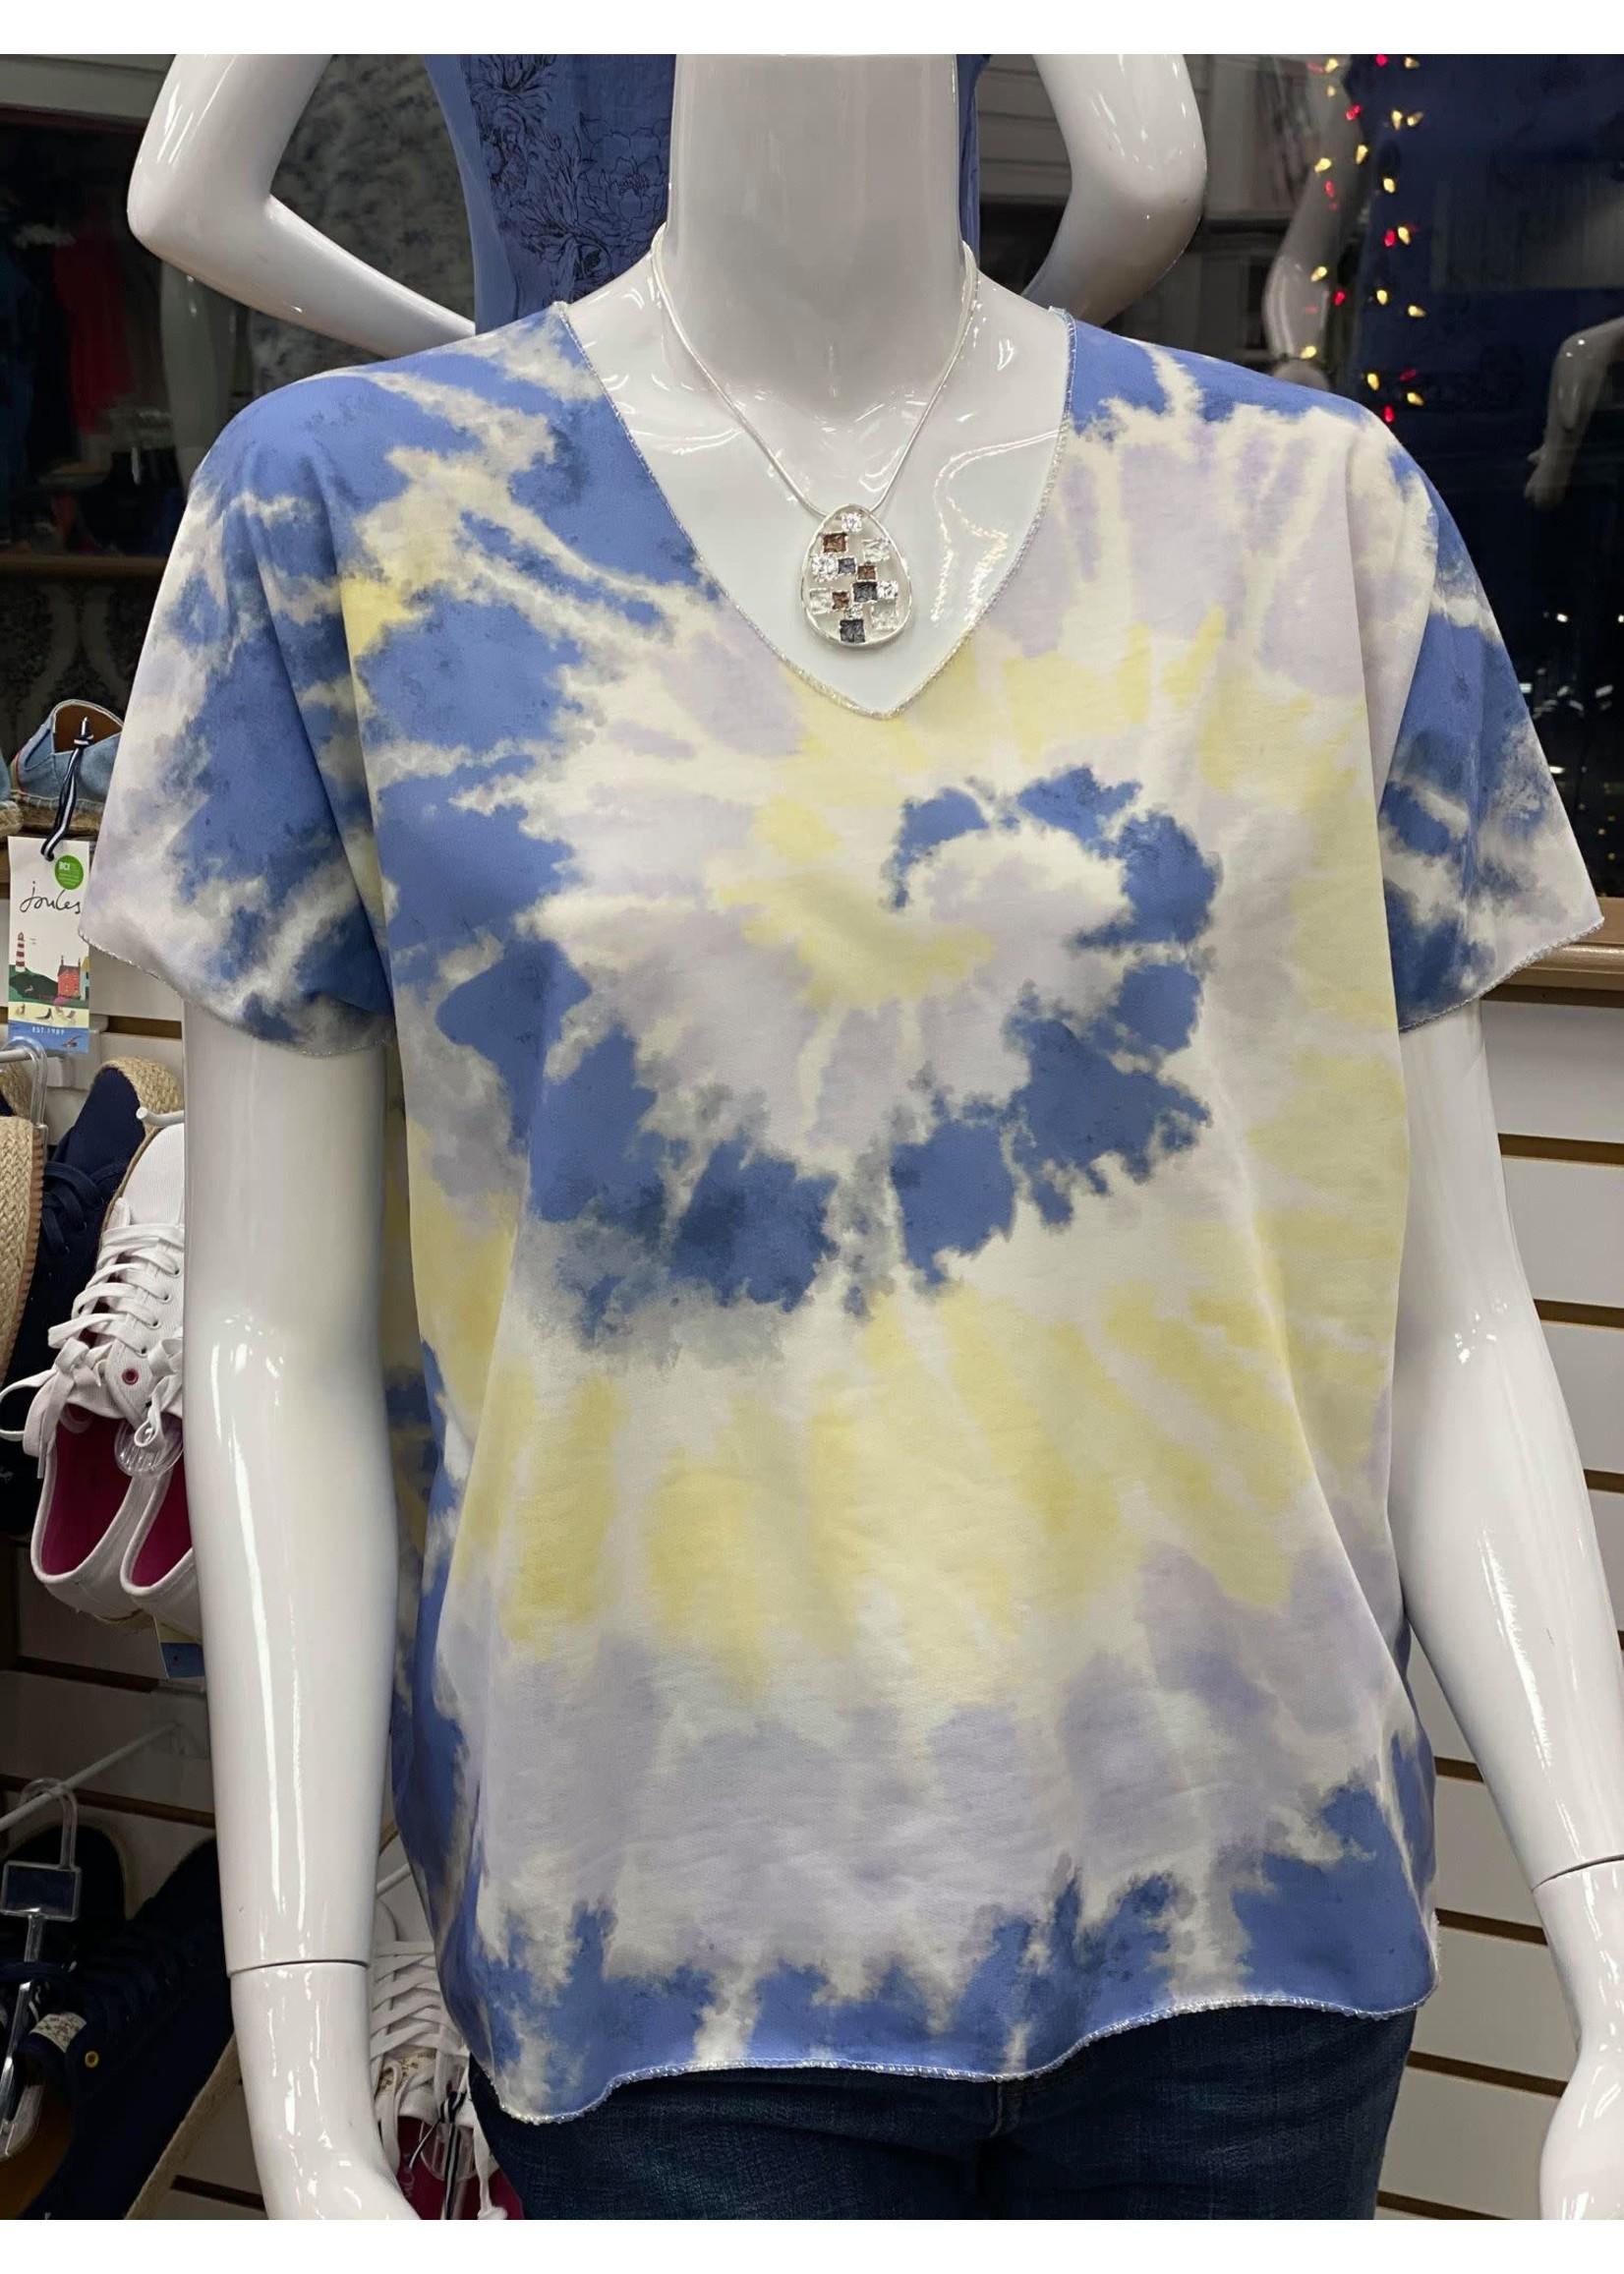 Angela Mara Tye Dye Top With Lurex